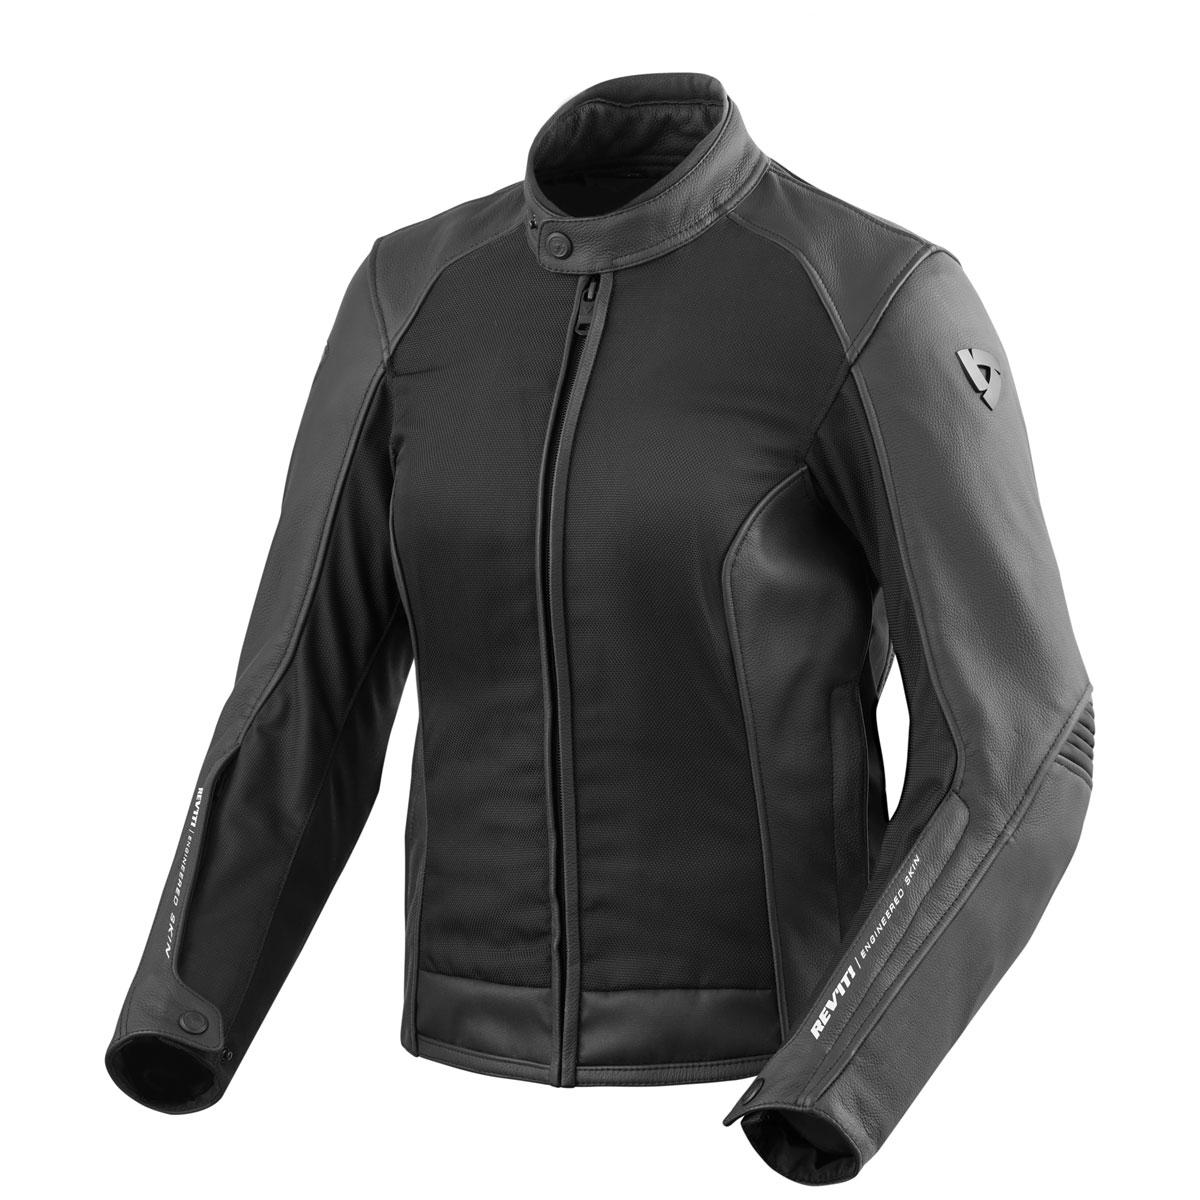 REV'IT! Women's Ignition 3 Black Jacket